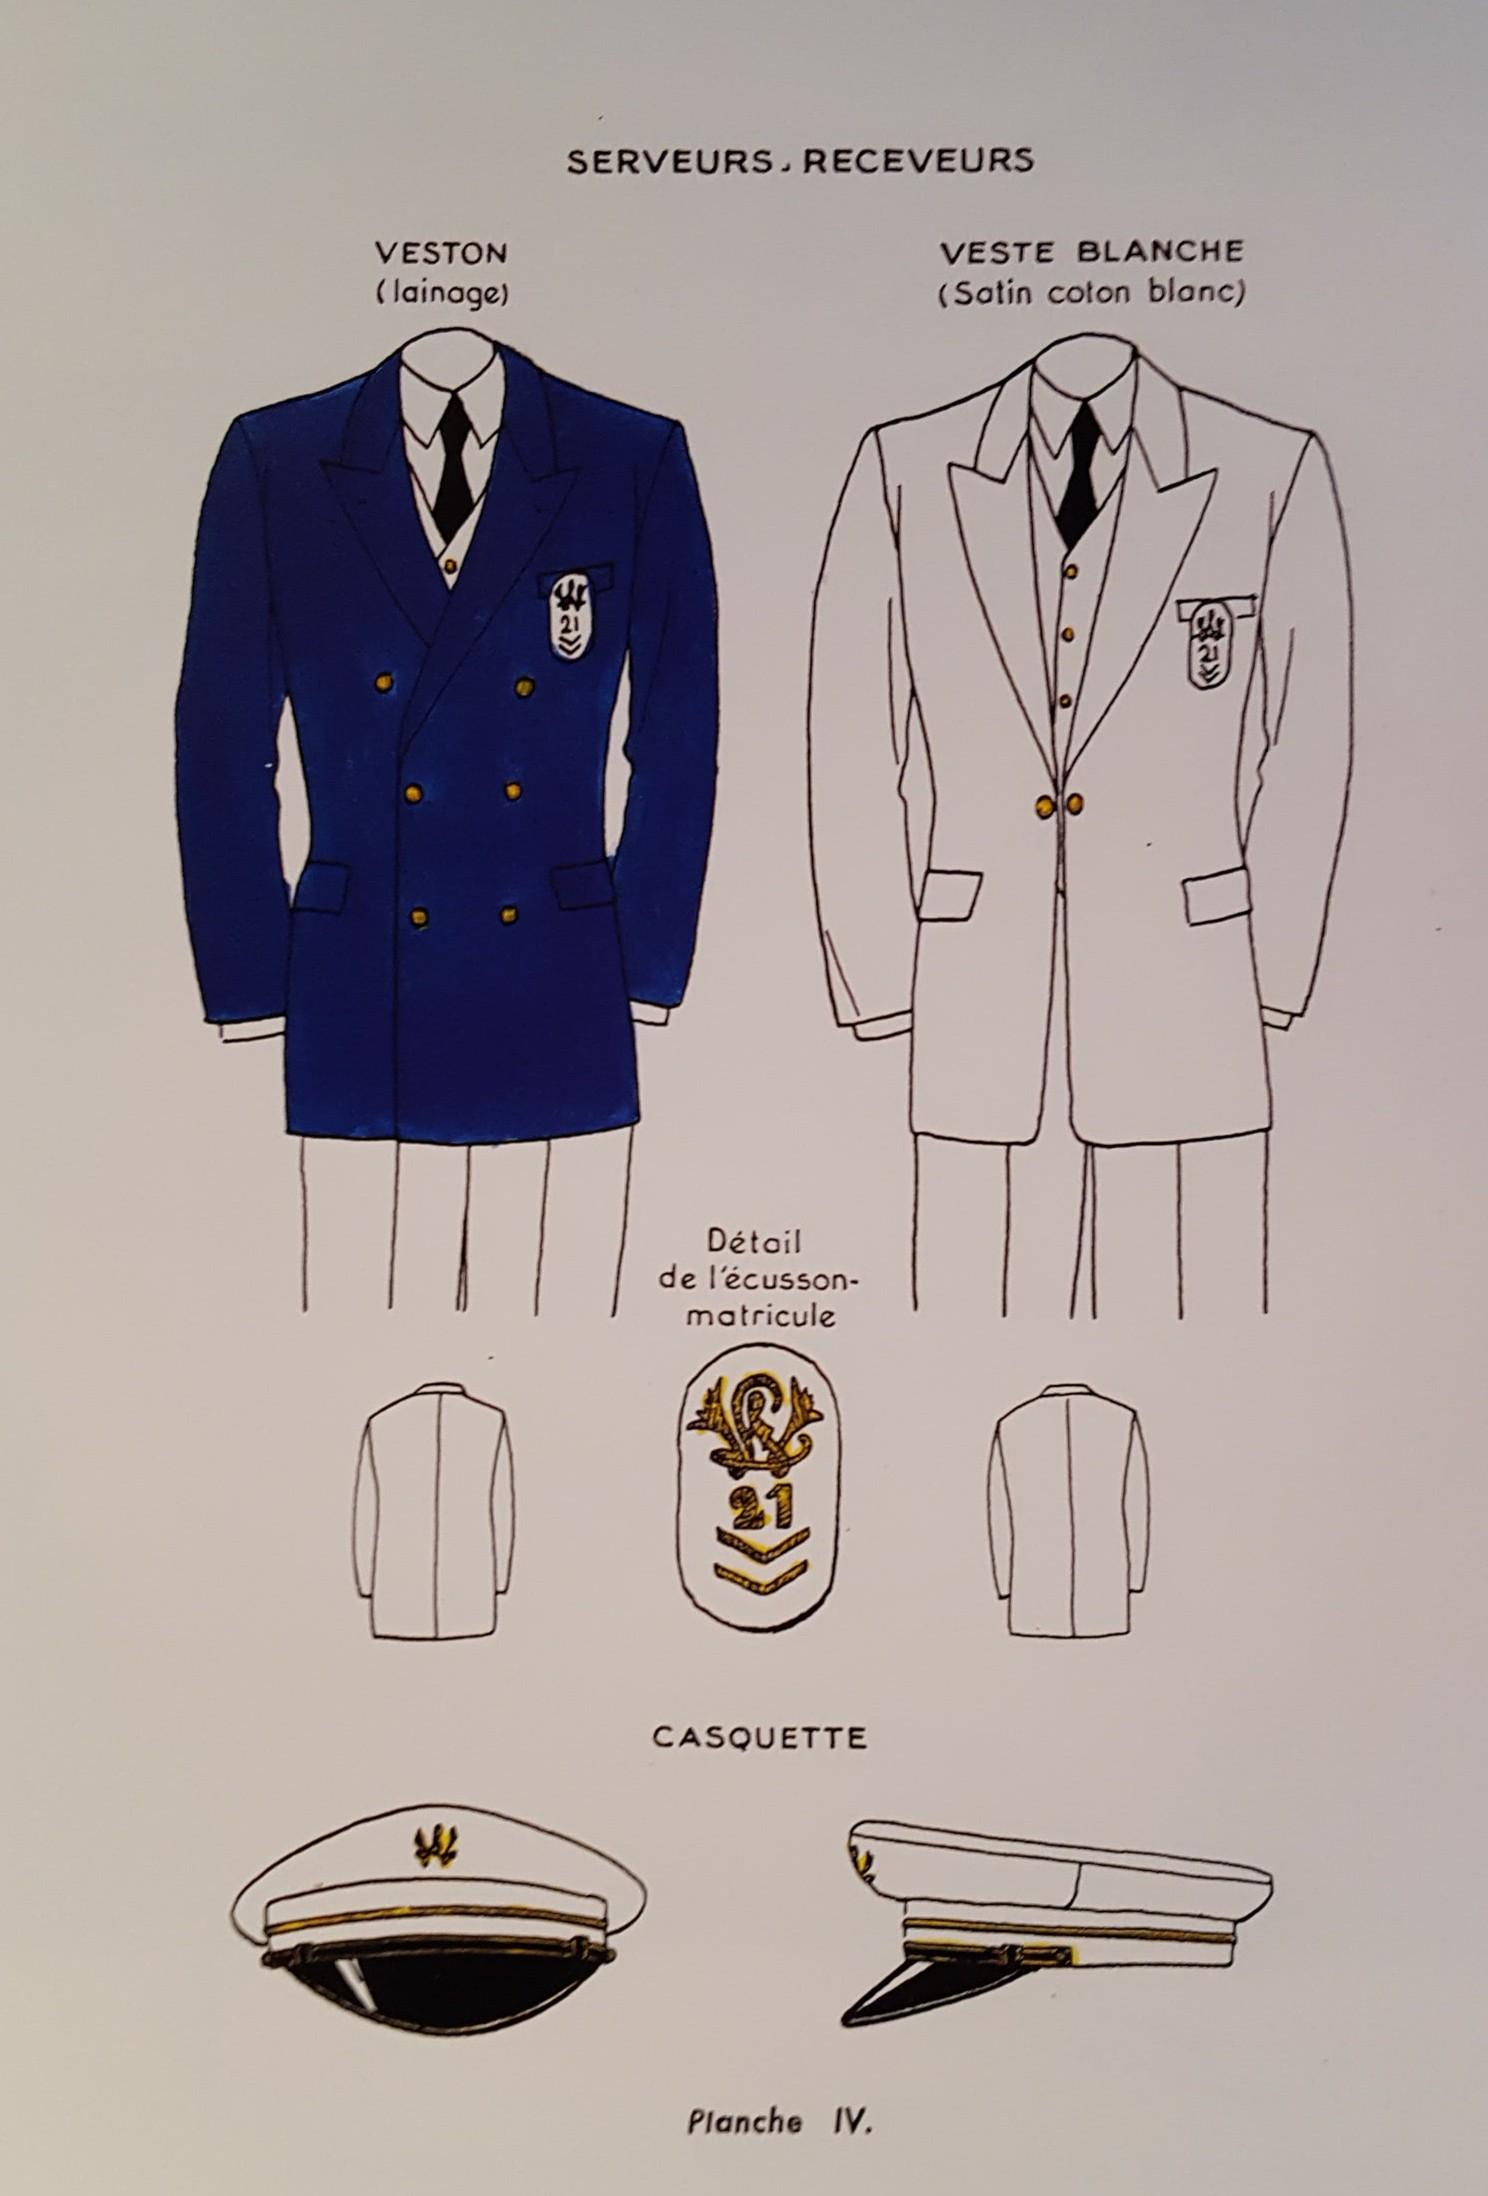 Wl uniforme receveur